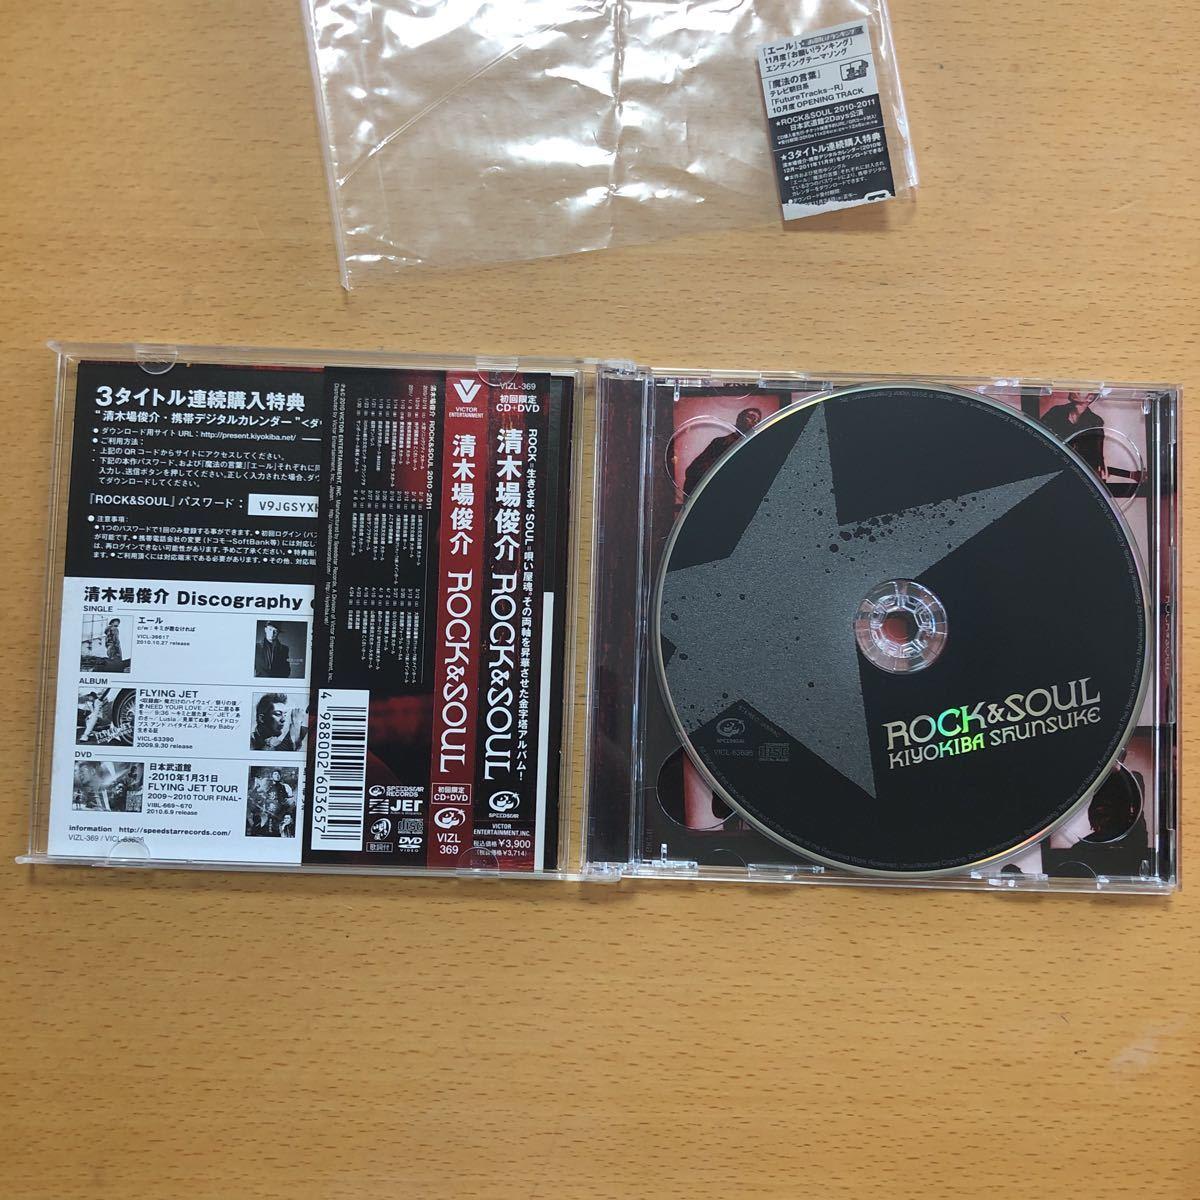 清木場俊介『ROCK&SOUL』初回限定盤CD+DVD☆帯付☆美品☆アルバム☆71_画像2